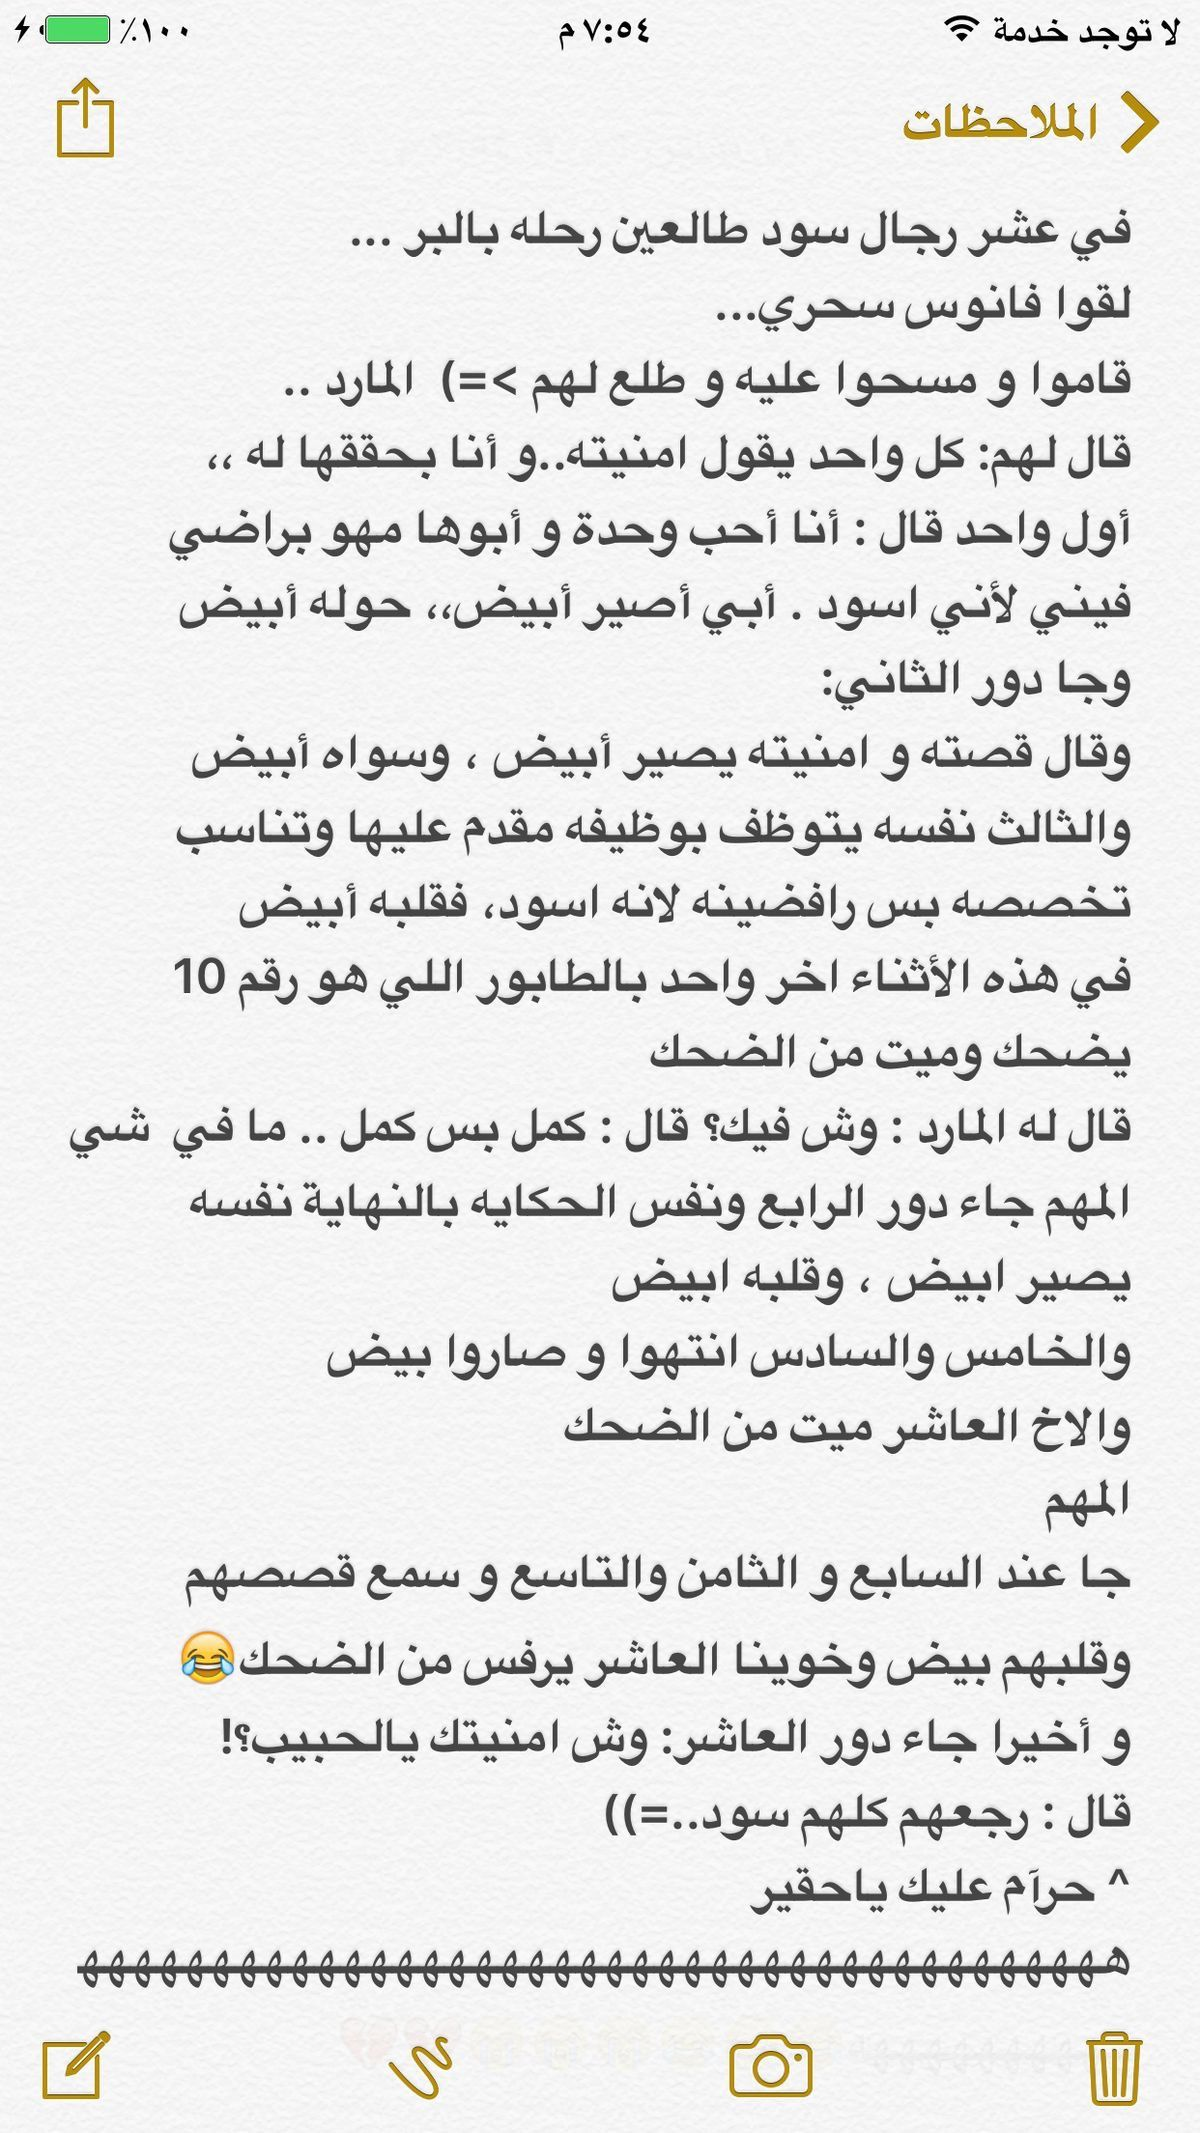 نذلللل Funny Words Funny Arabic Quotes Arabic Funny